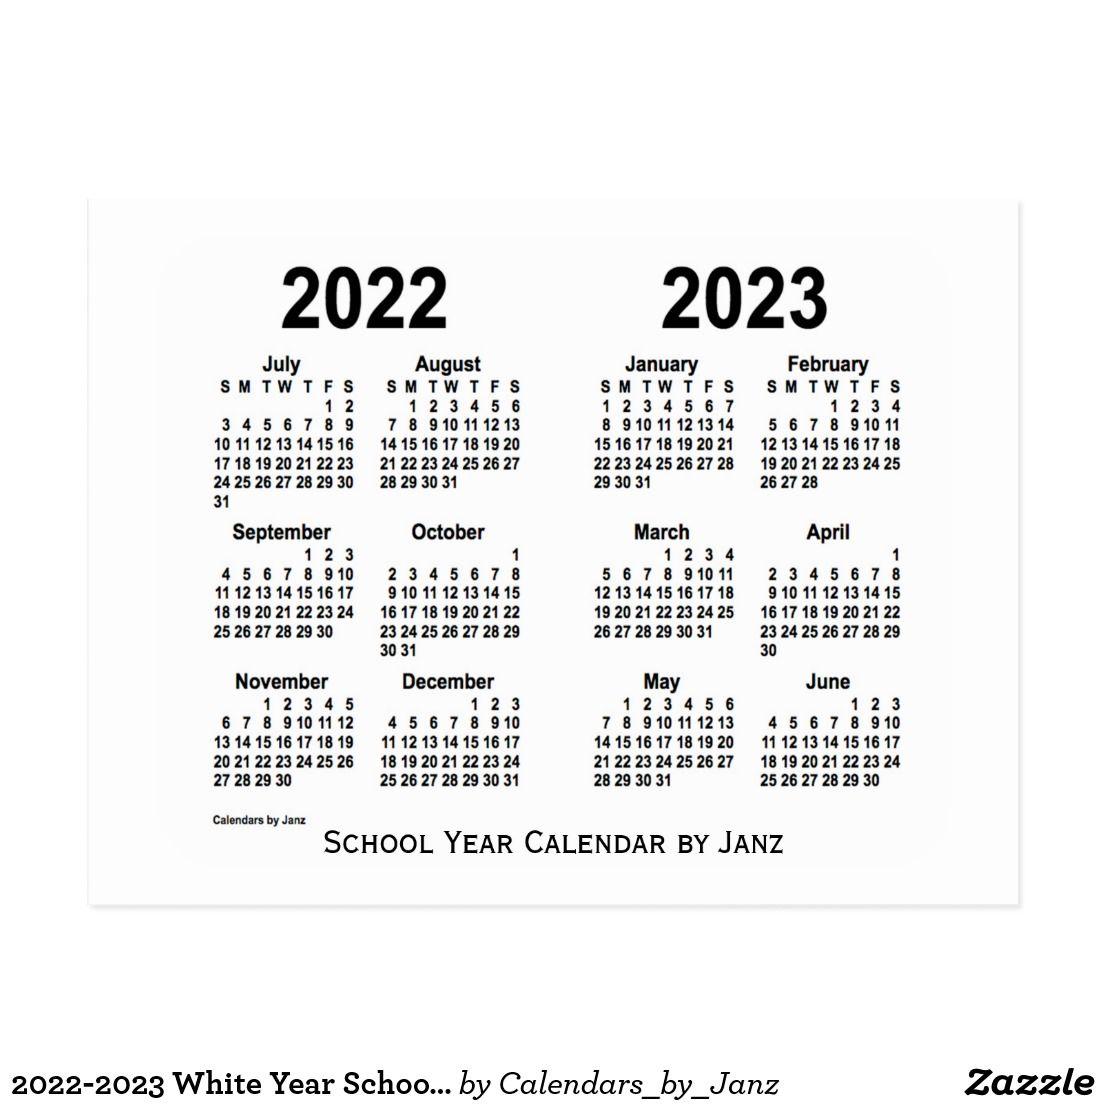 2022-2023 White Year School Calendarjanz Postcard in Aiken County 2022 2023 School Calendar